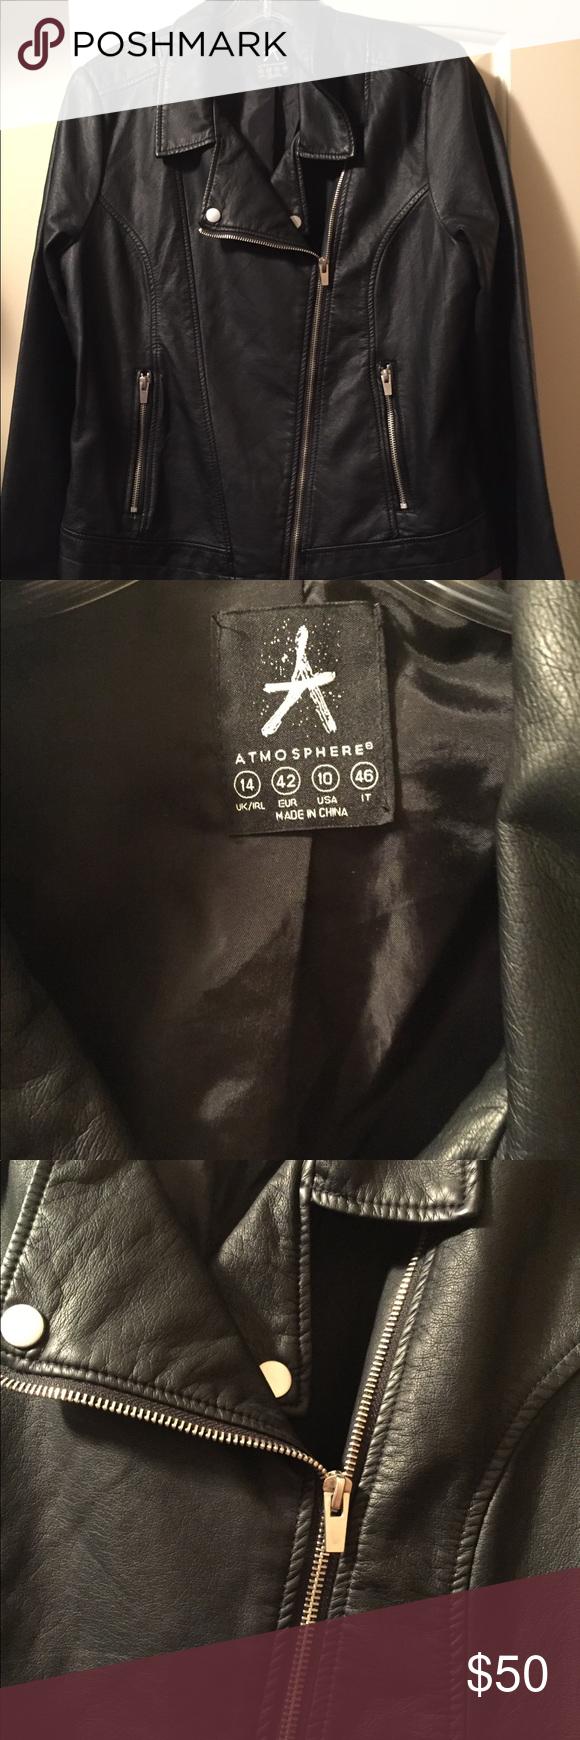 Atmosphere Moto Jacket Super soft and supple black vegan